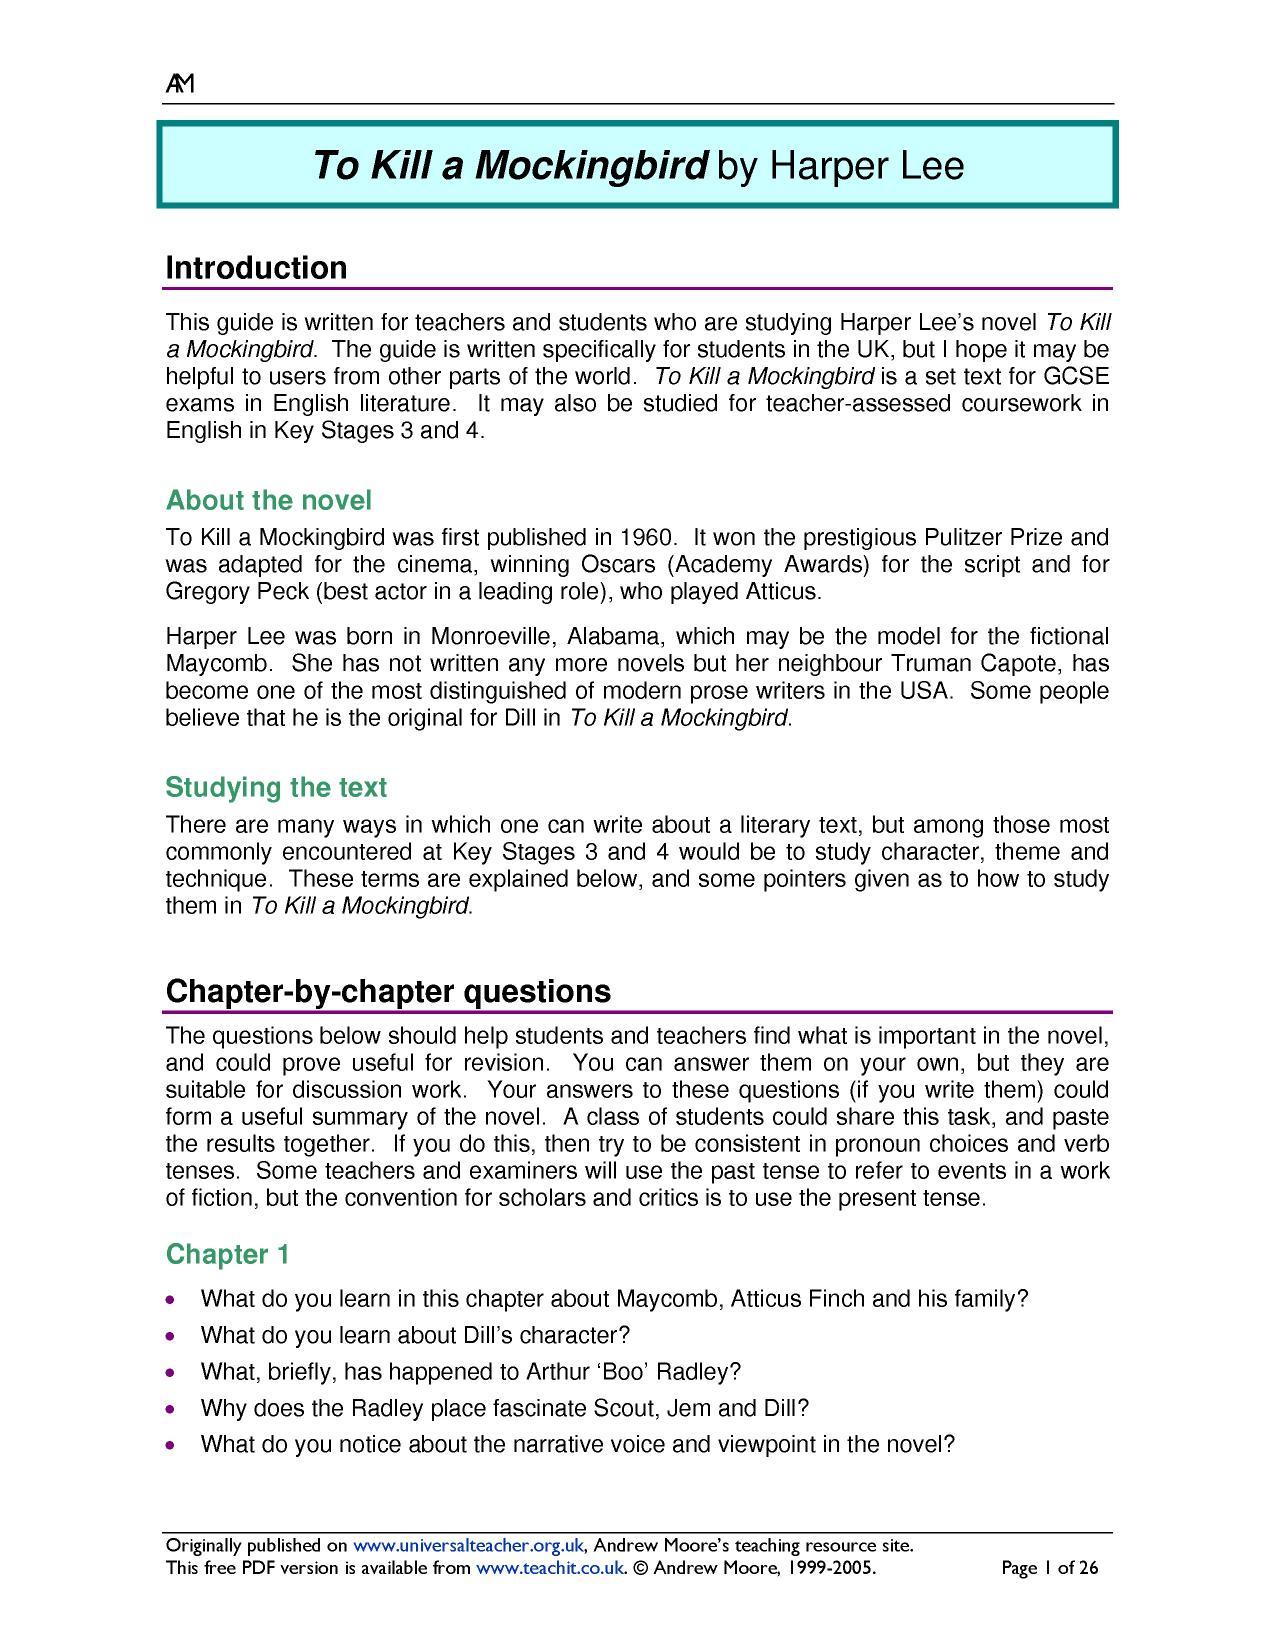 Essay Help On To Kill A Mockingbird